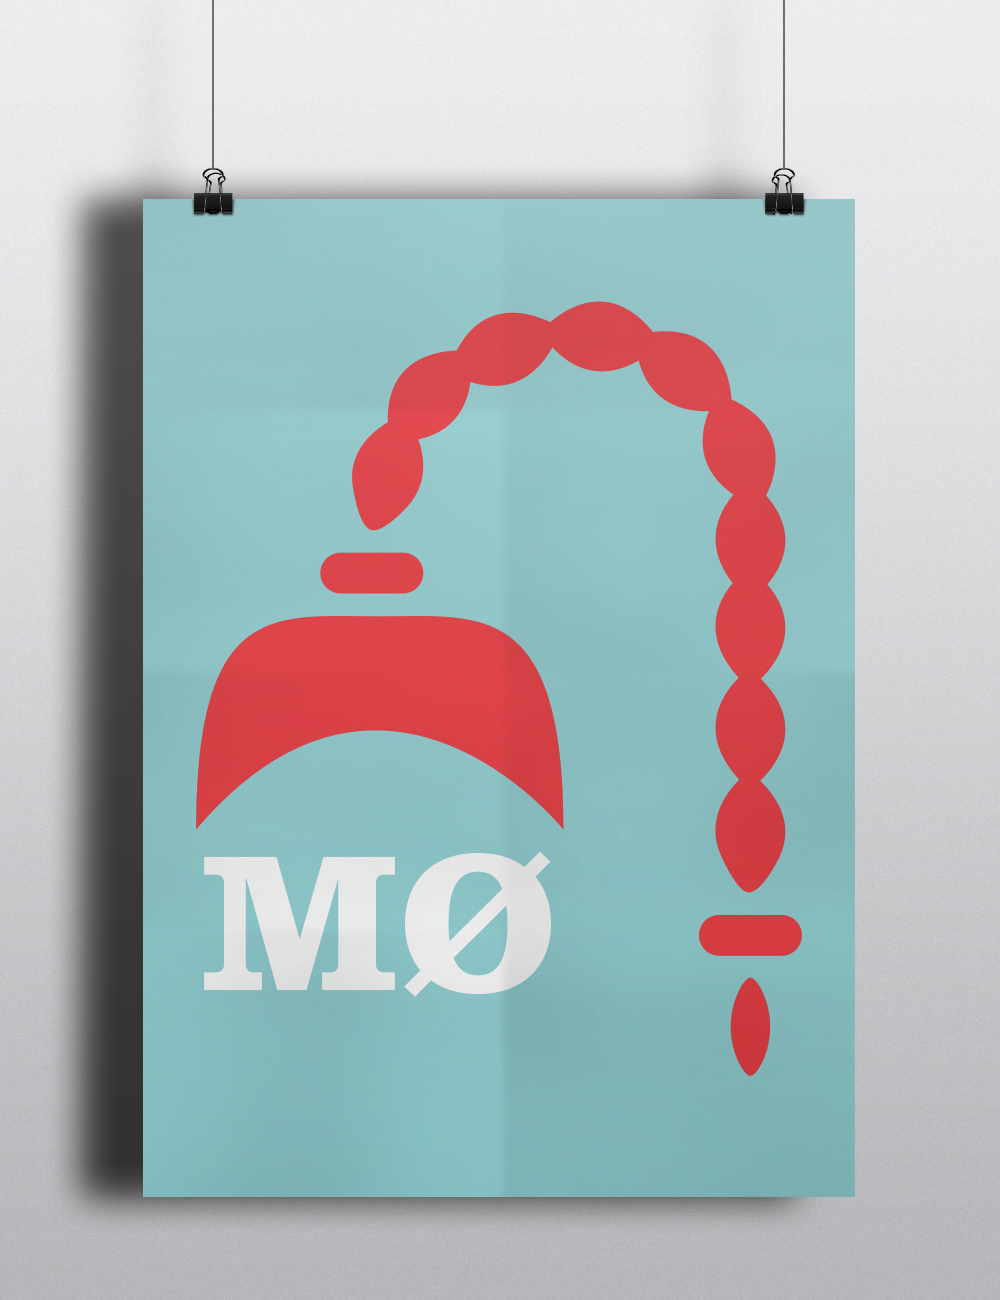 philipjohansen_moe_mockup